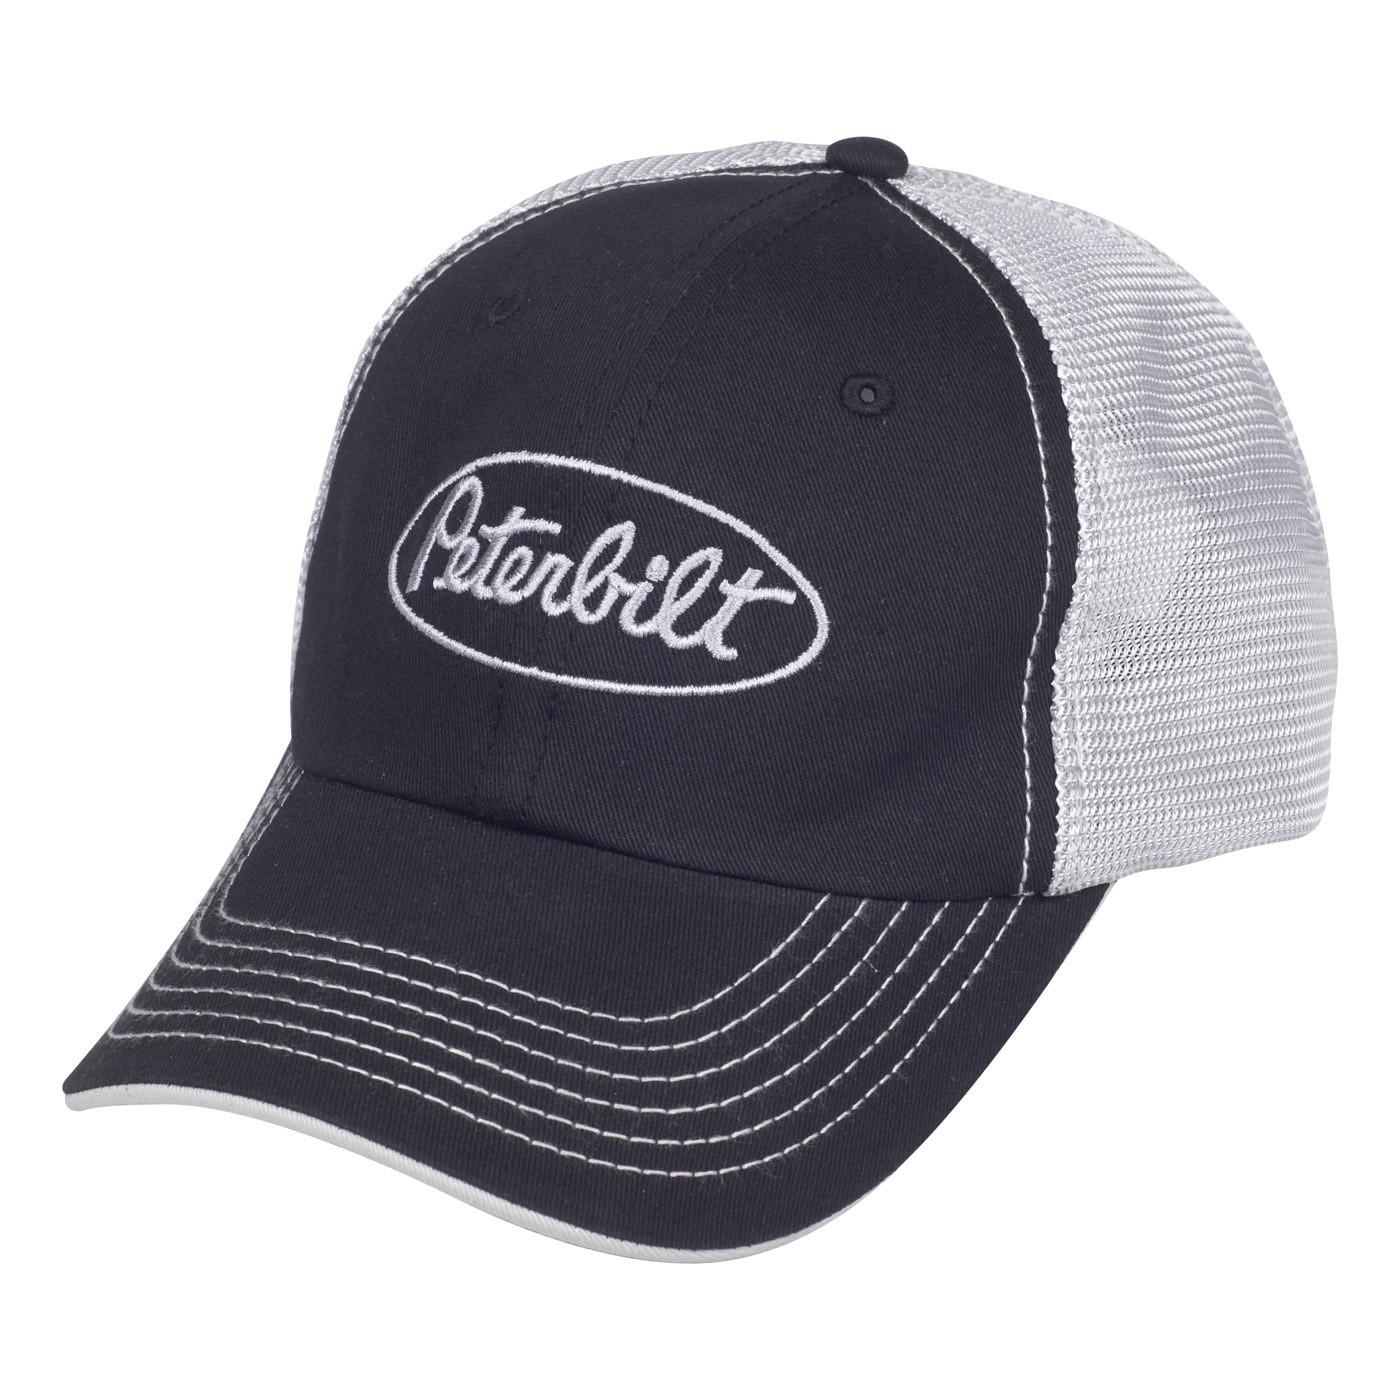 Peterbilt Mesh Back Cap Black